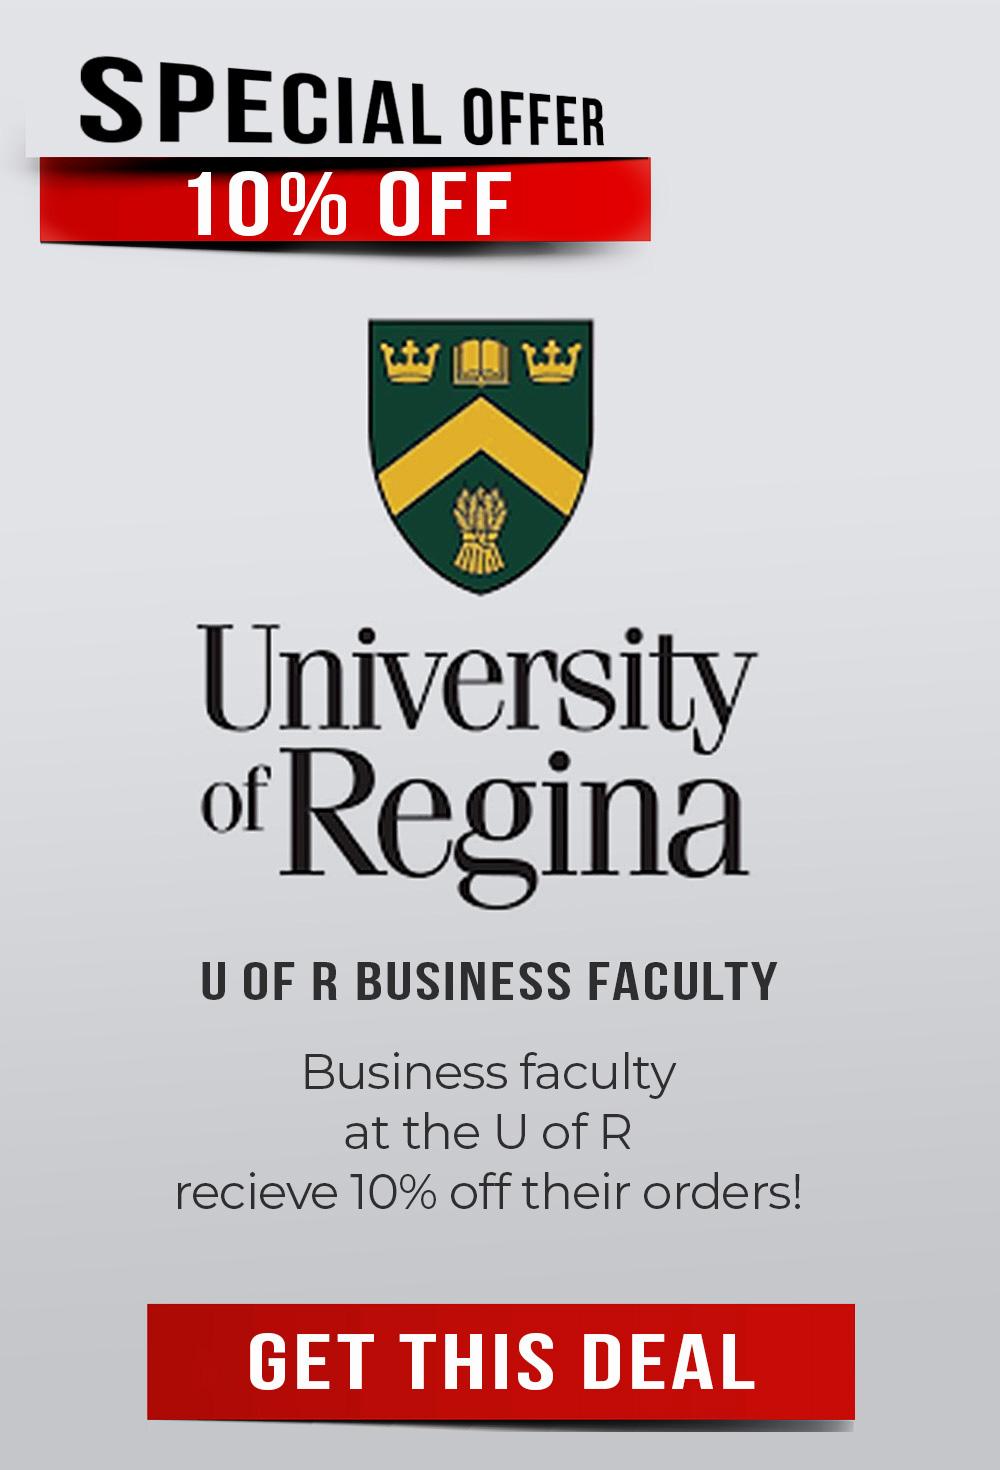 university-of-regina-prairie-donair-discount.jpg